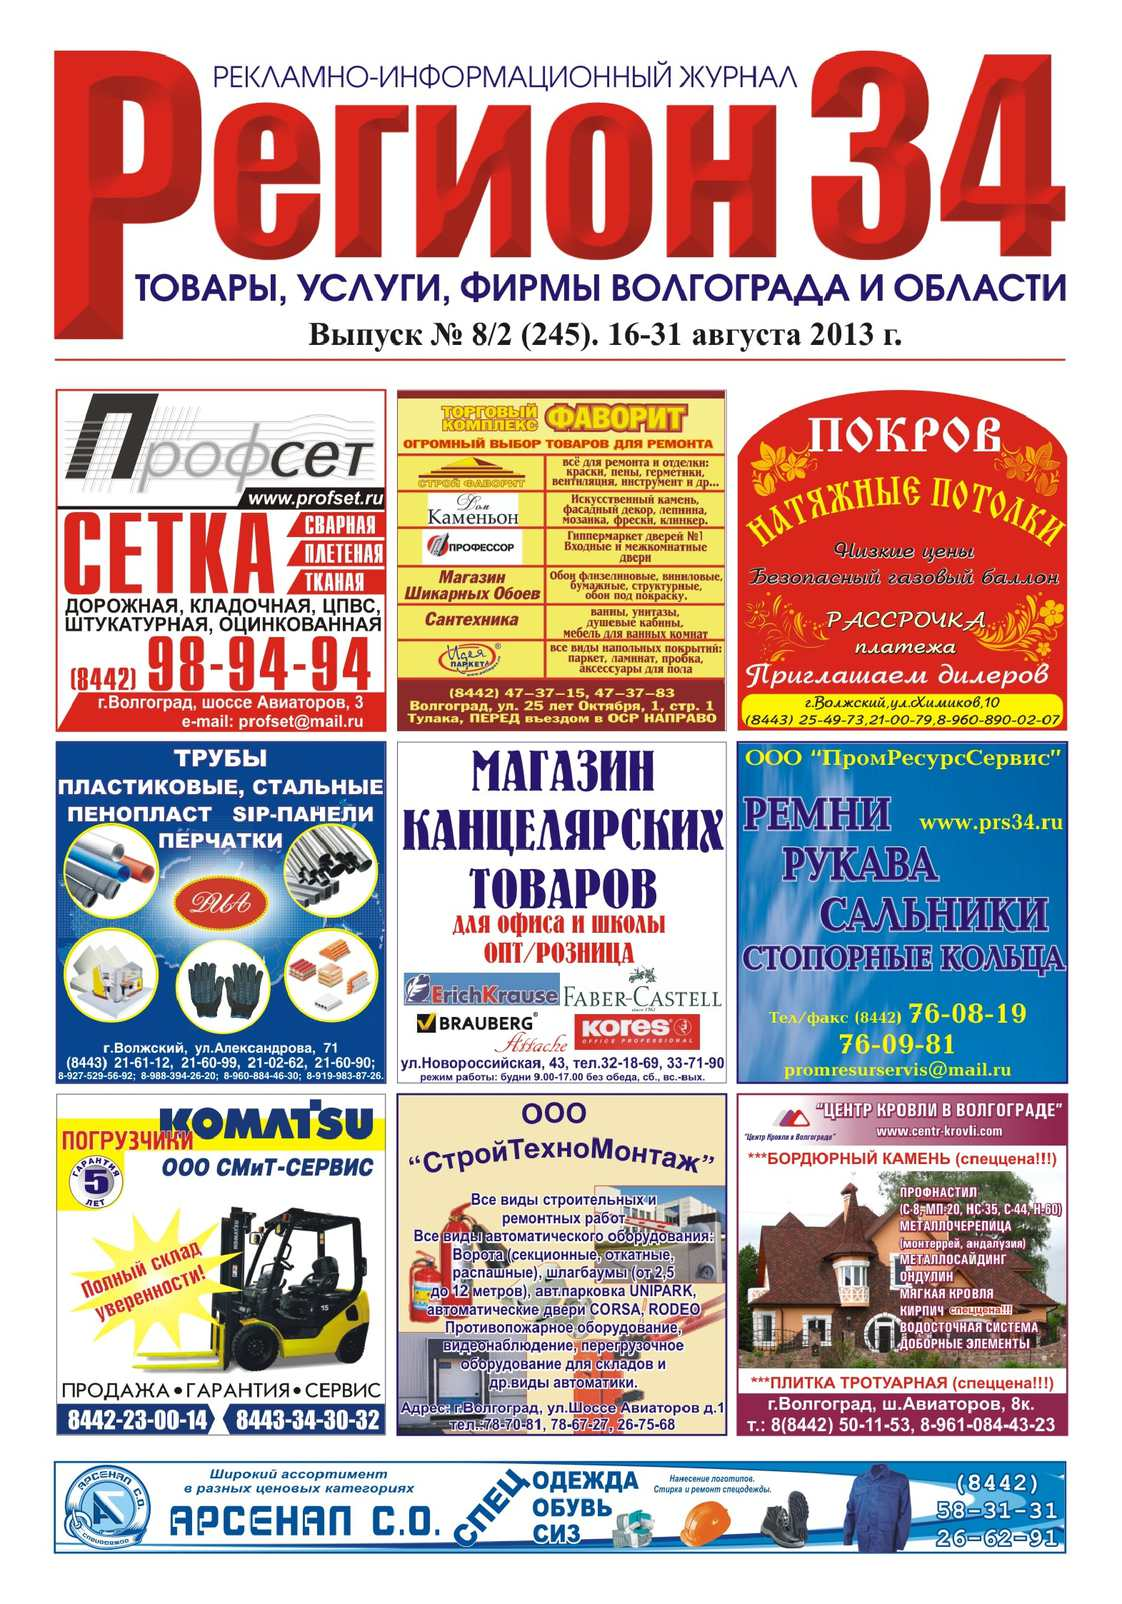 Calaméo - Регион34 выпуск 245 август(2) 2013 г 58763f201e63e